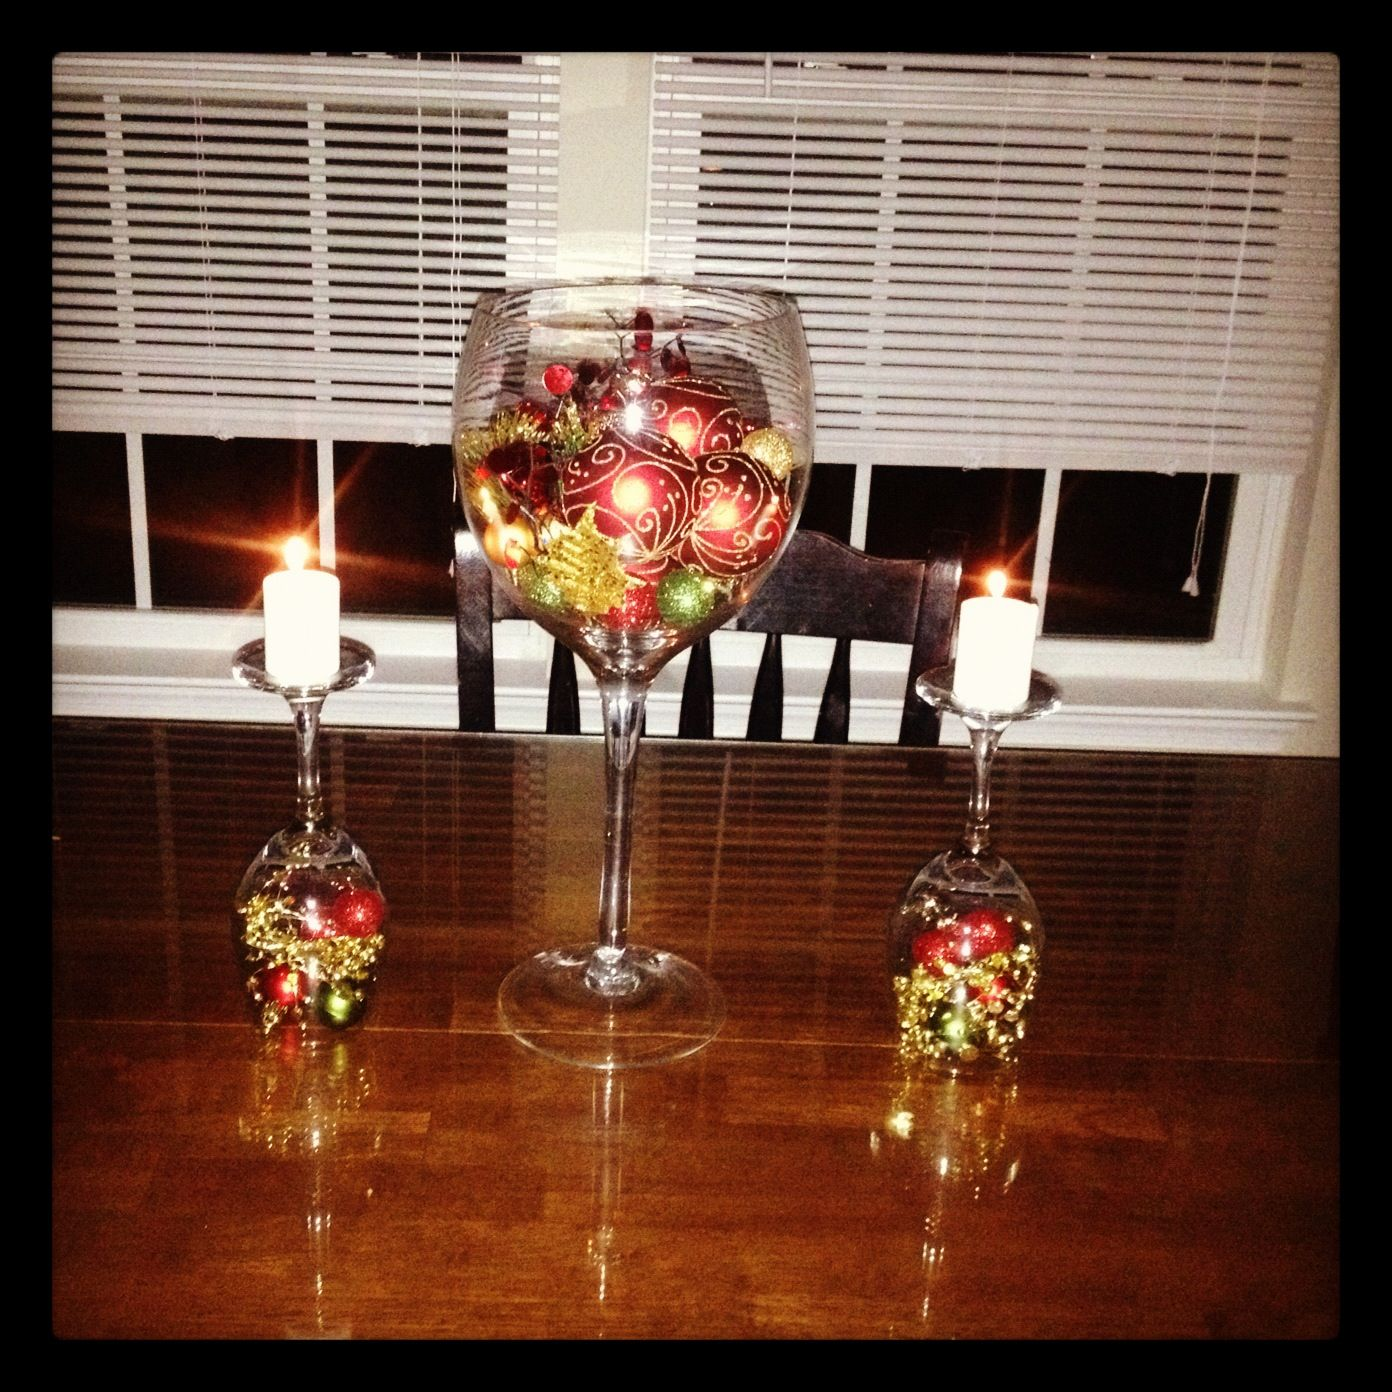 Kitchen Decorating Theme Ideas: Wine Glass Center Piece To Stick With My Wine Theme